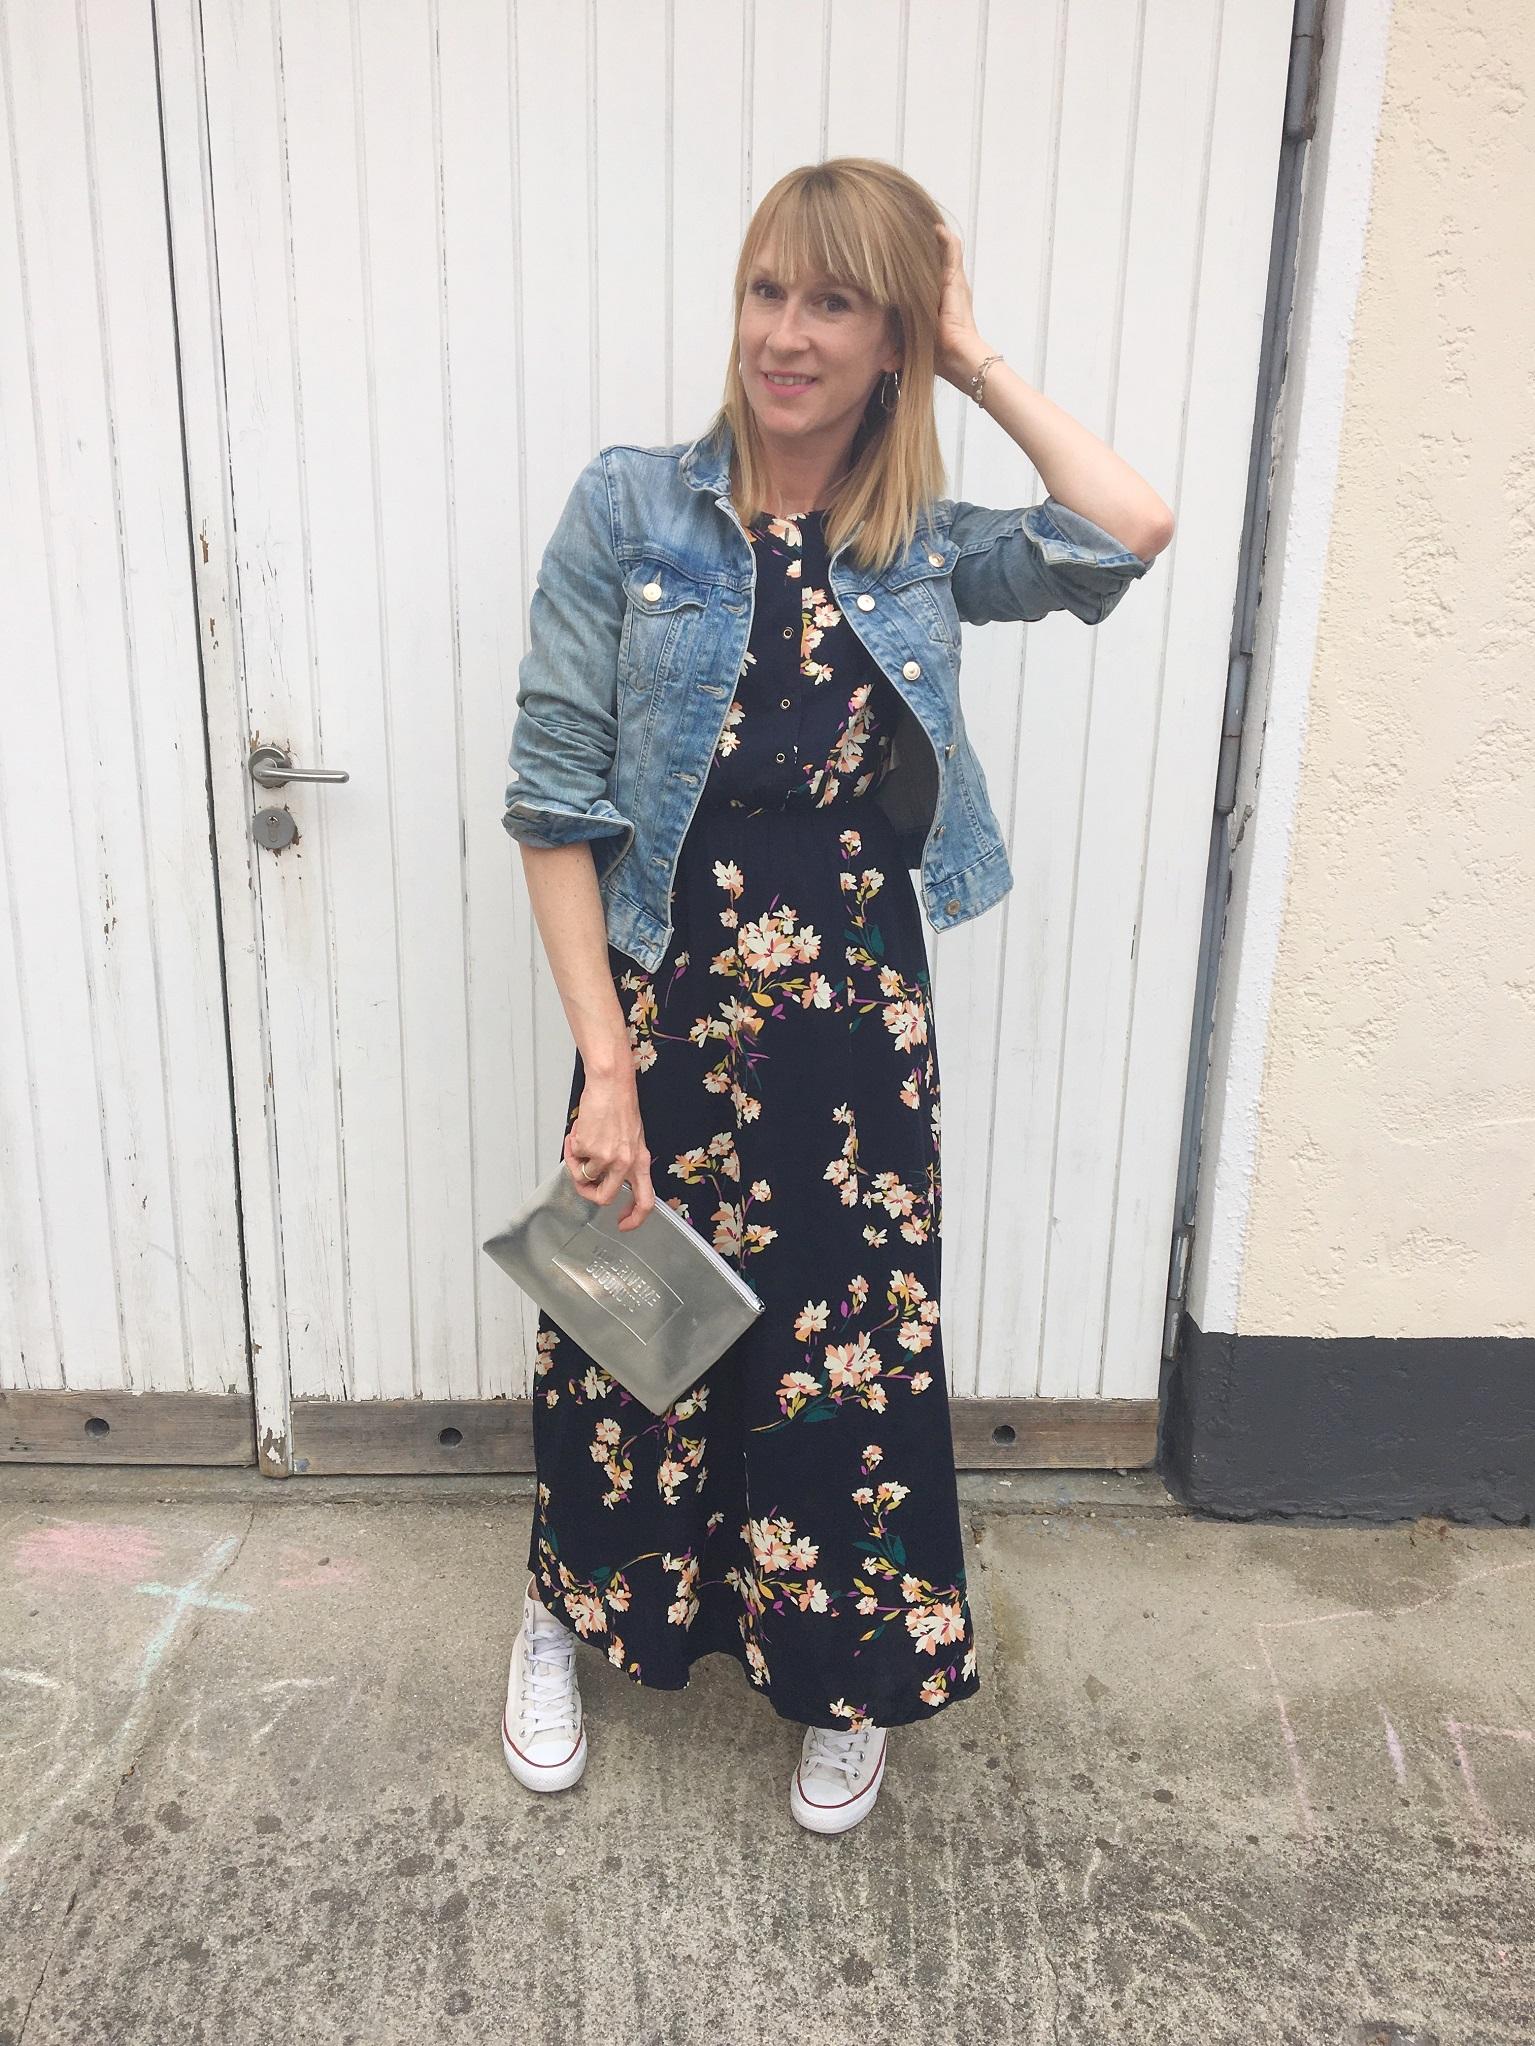 Mamablog über Mode: Comeback für lange Sommerkleider